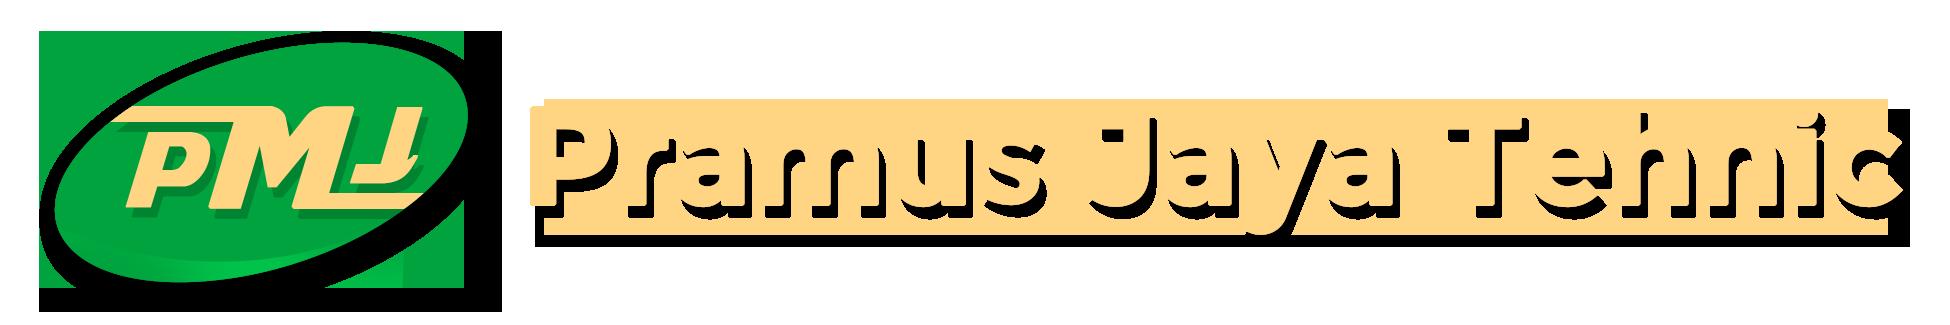 Pramus Jaya Tehnic